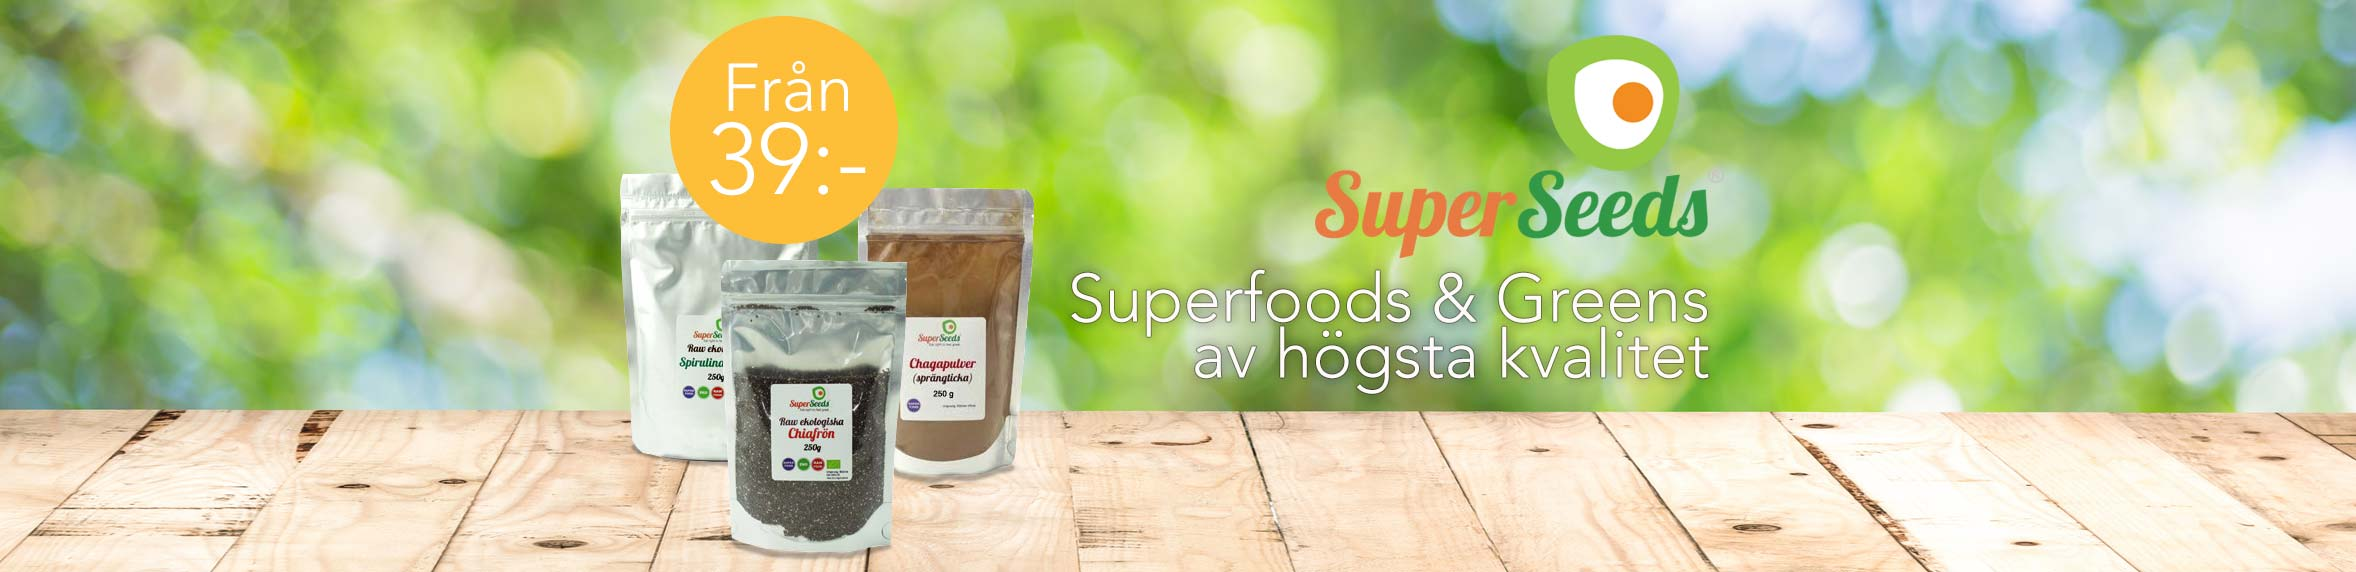 Superfoods från SuperSeeds